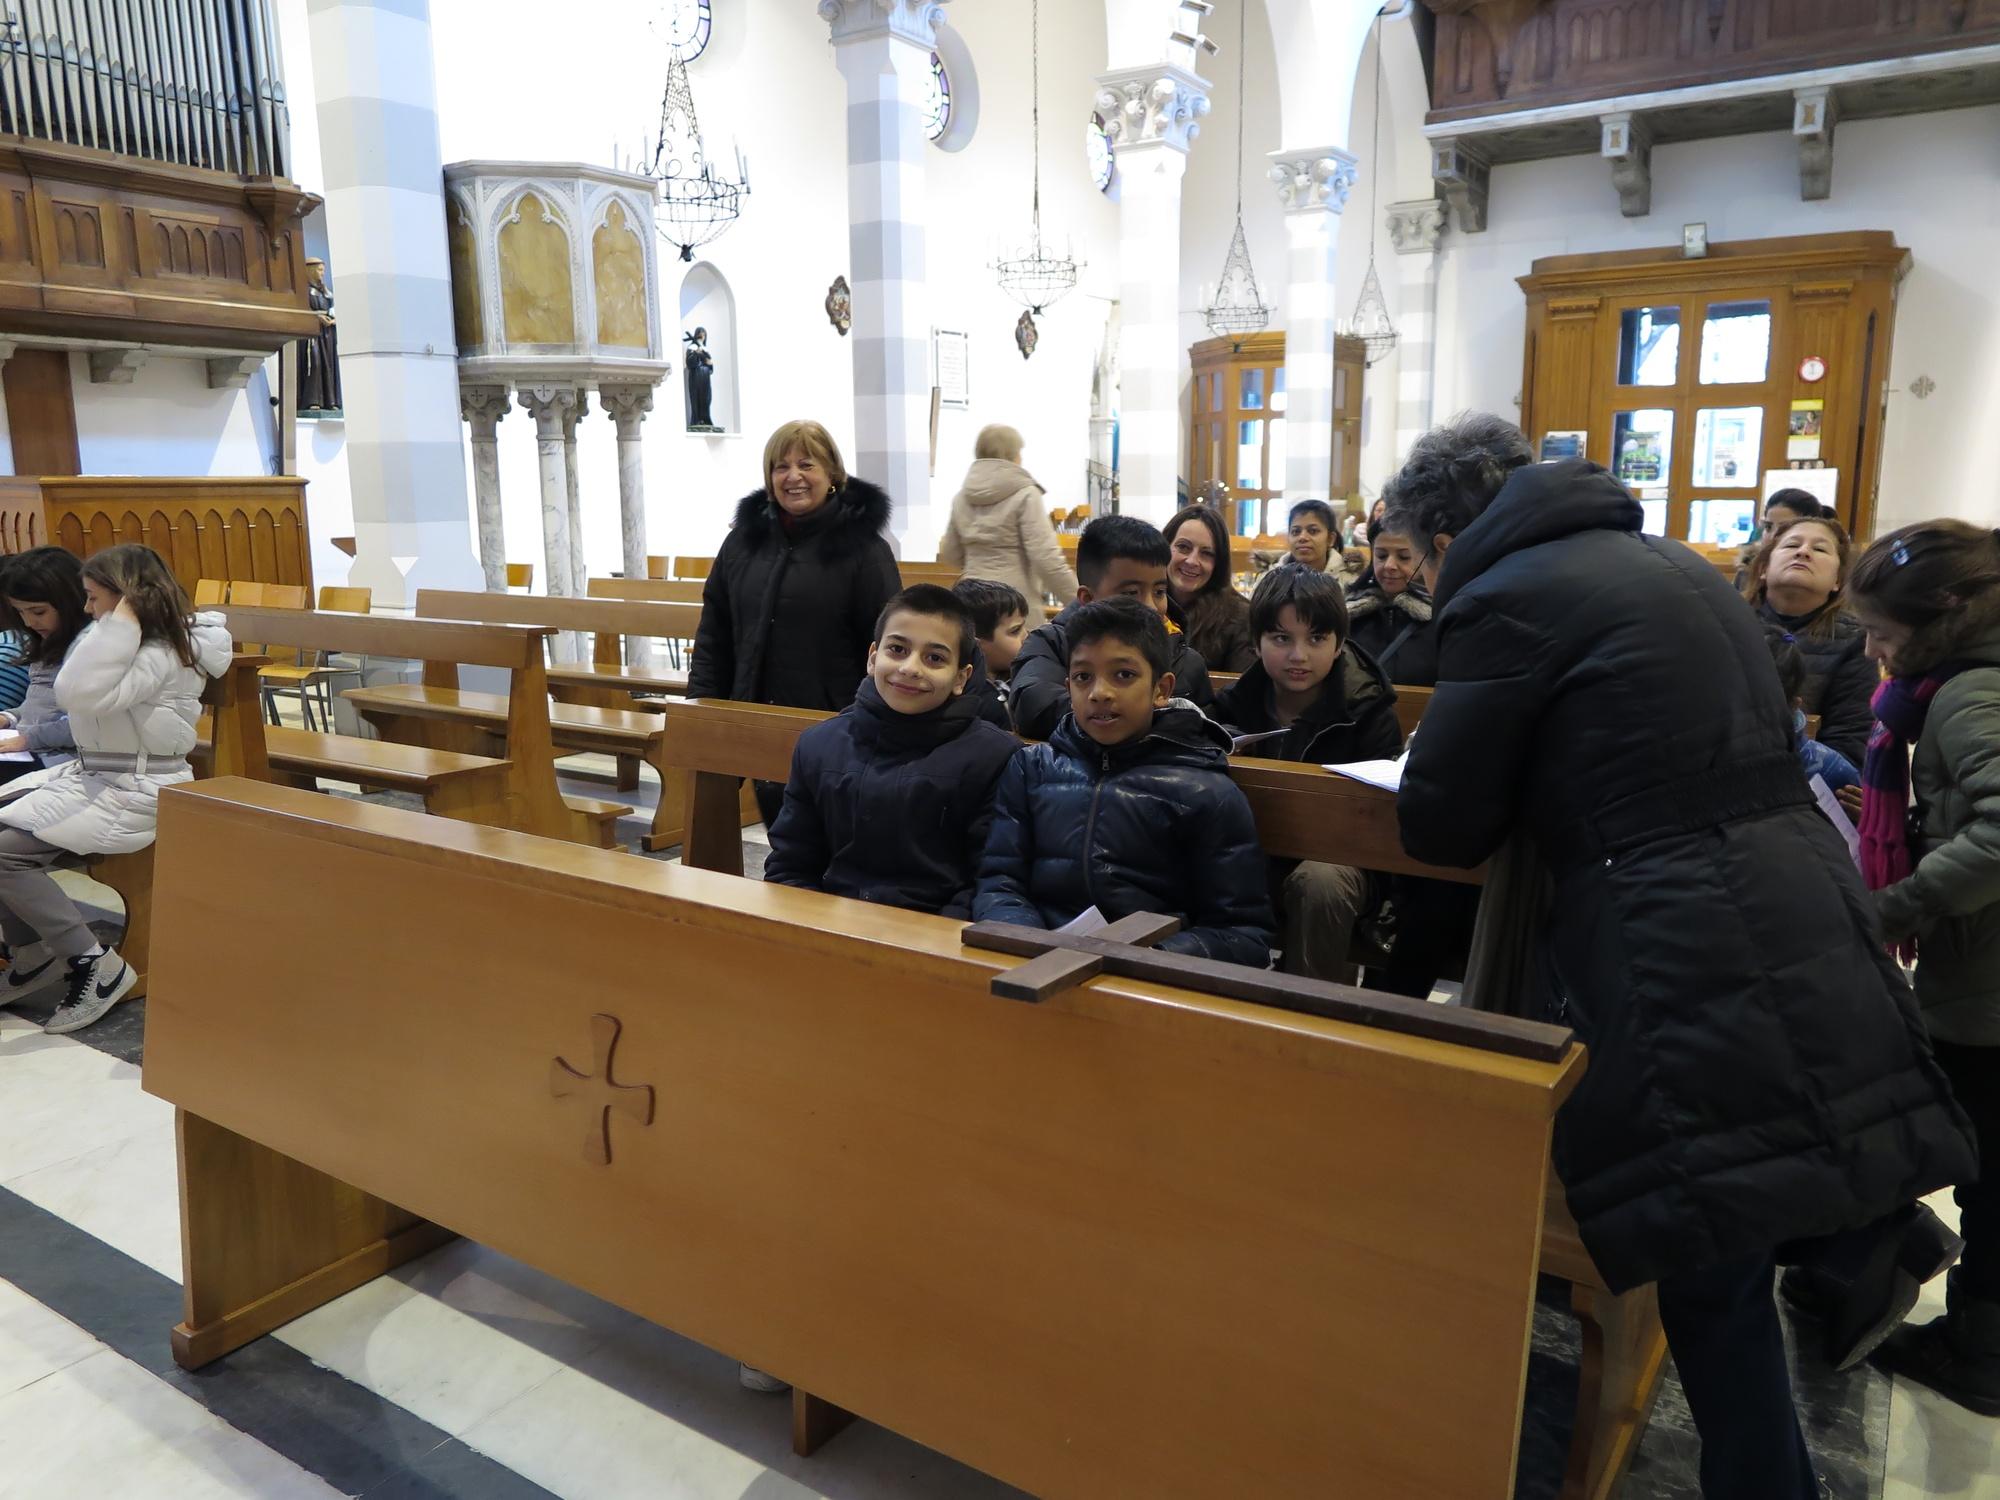 via-crucis-catechismo-2016-03-17-17-01-10